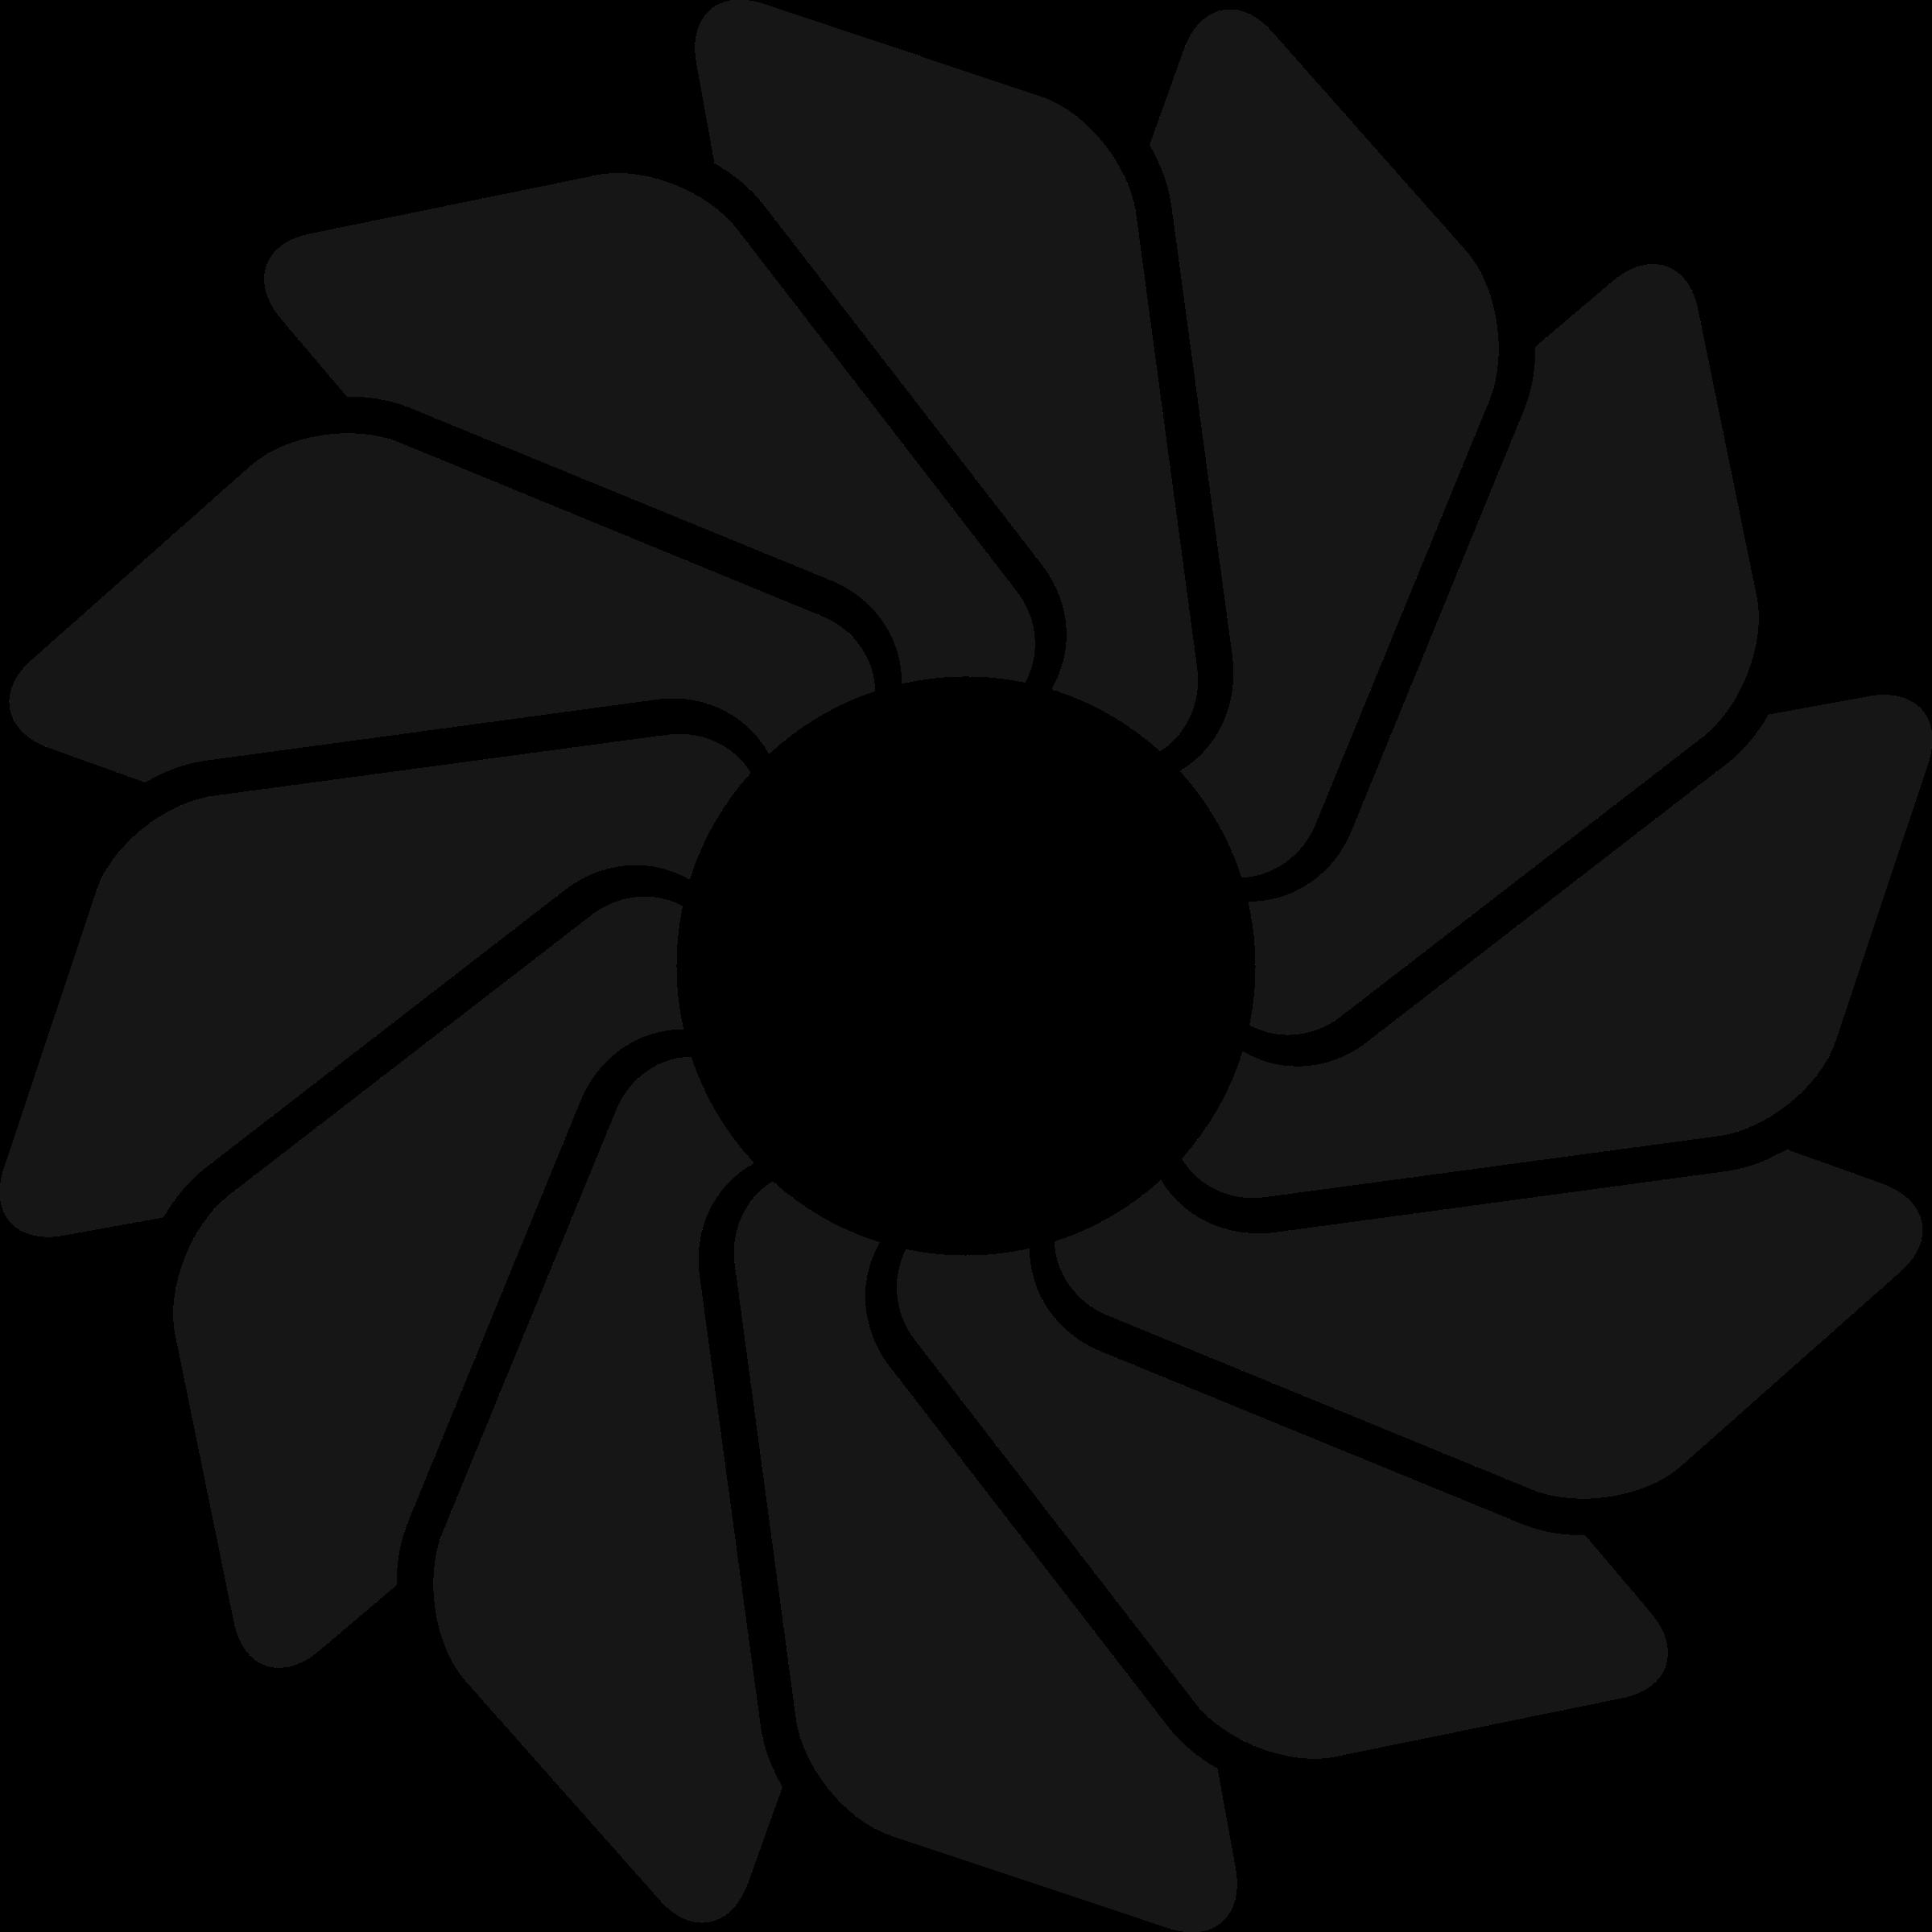 Loading clipart black and white Wheel Modern Loading Icon Wheel